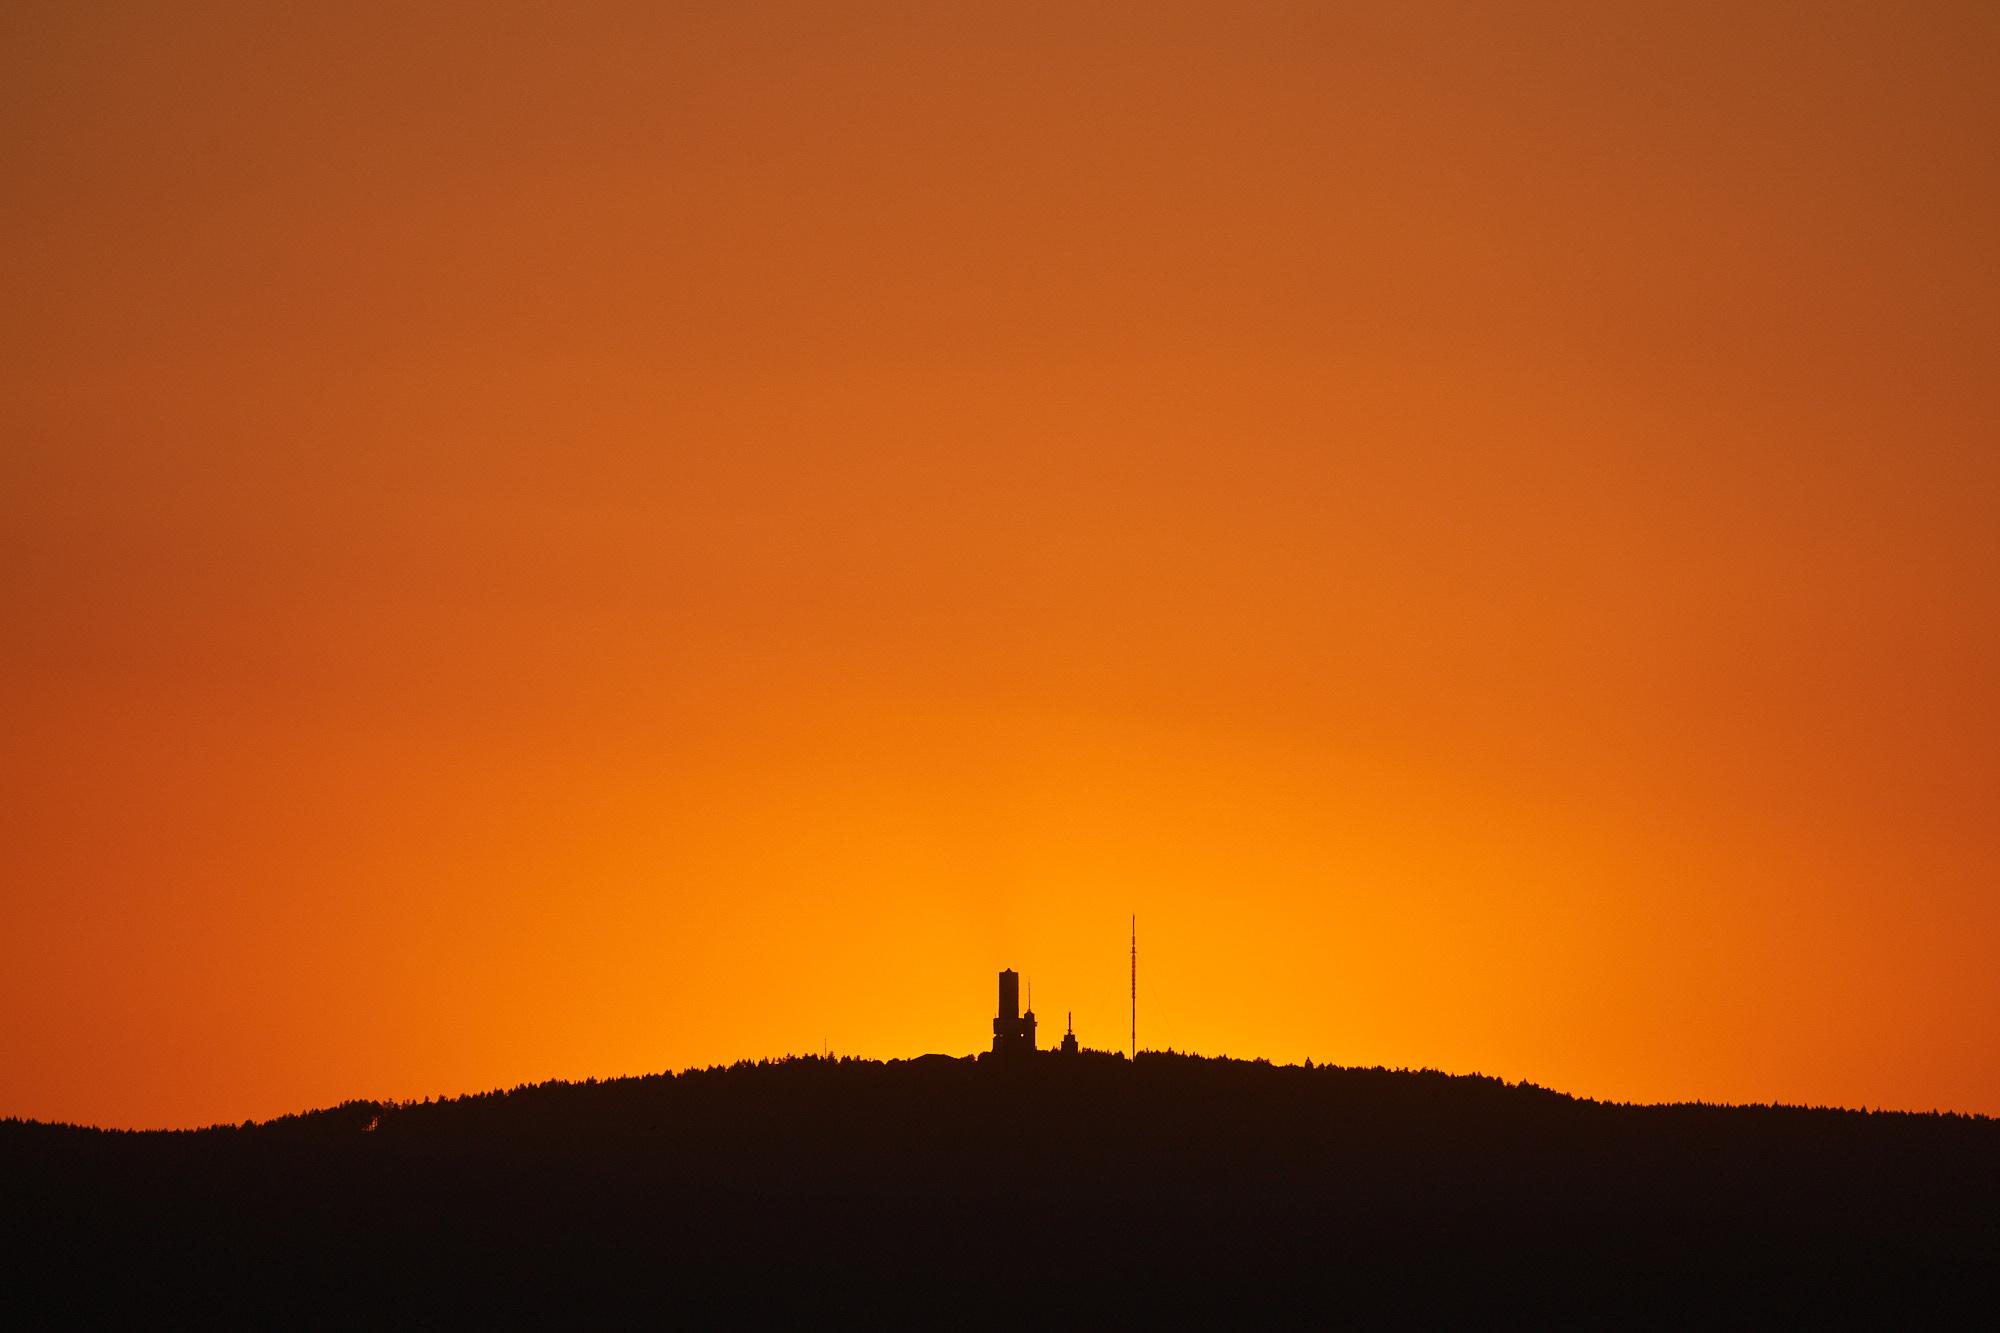 expresskasse / Feldberg nach Sonnenuntergang